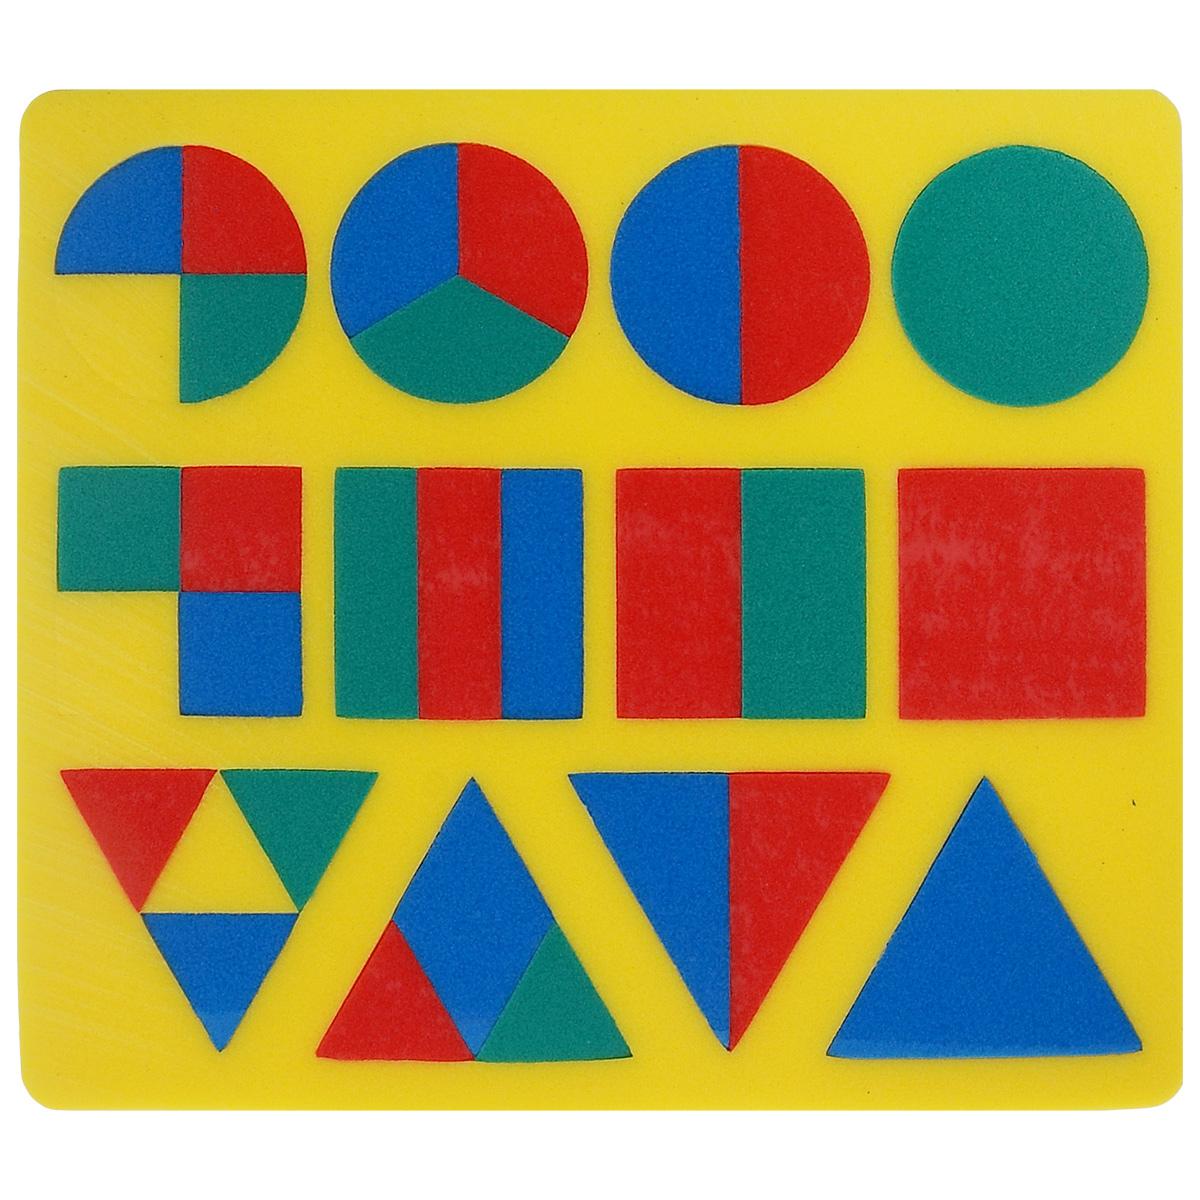 Флексика Пазл для малышей Геометрия цвет основы желтый флексика пазл для малышей геометрия цвет основы красный